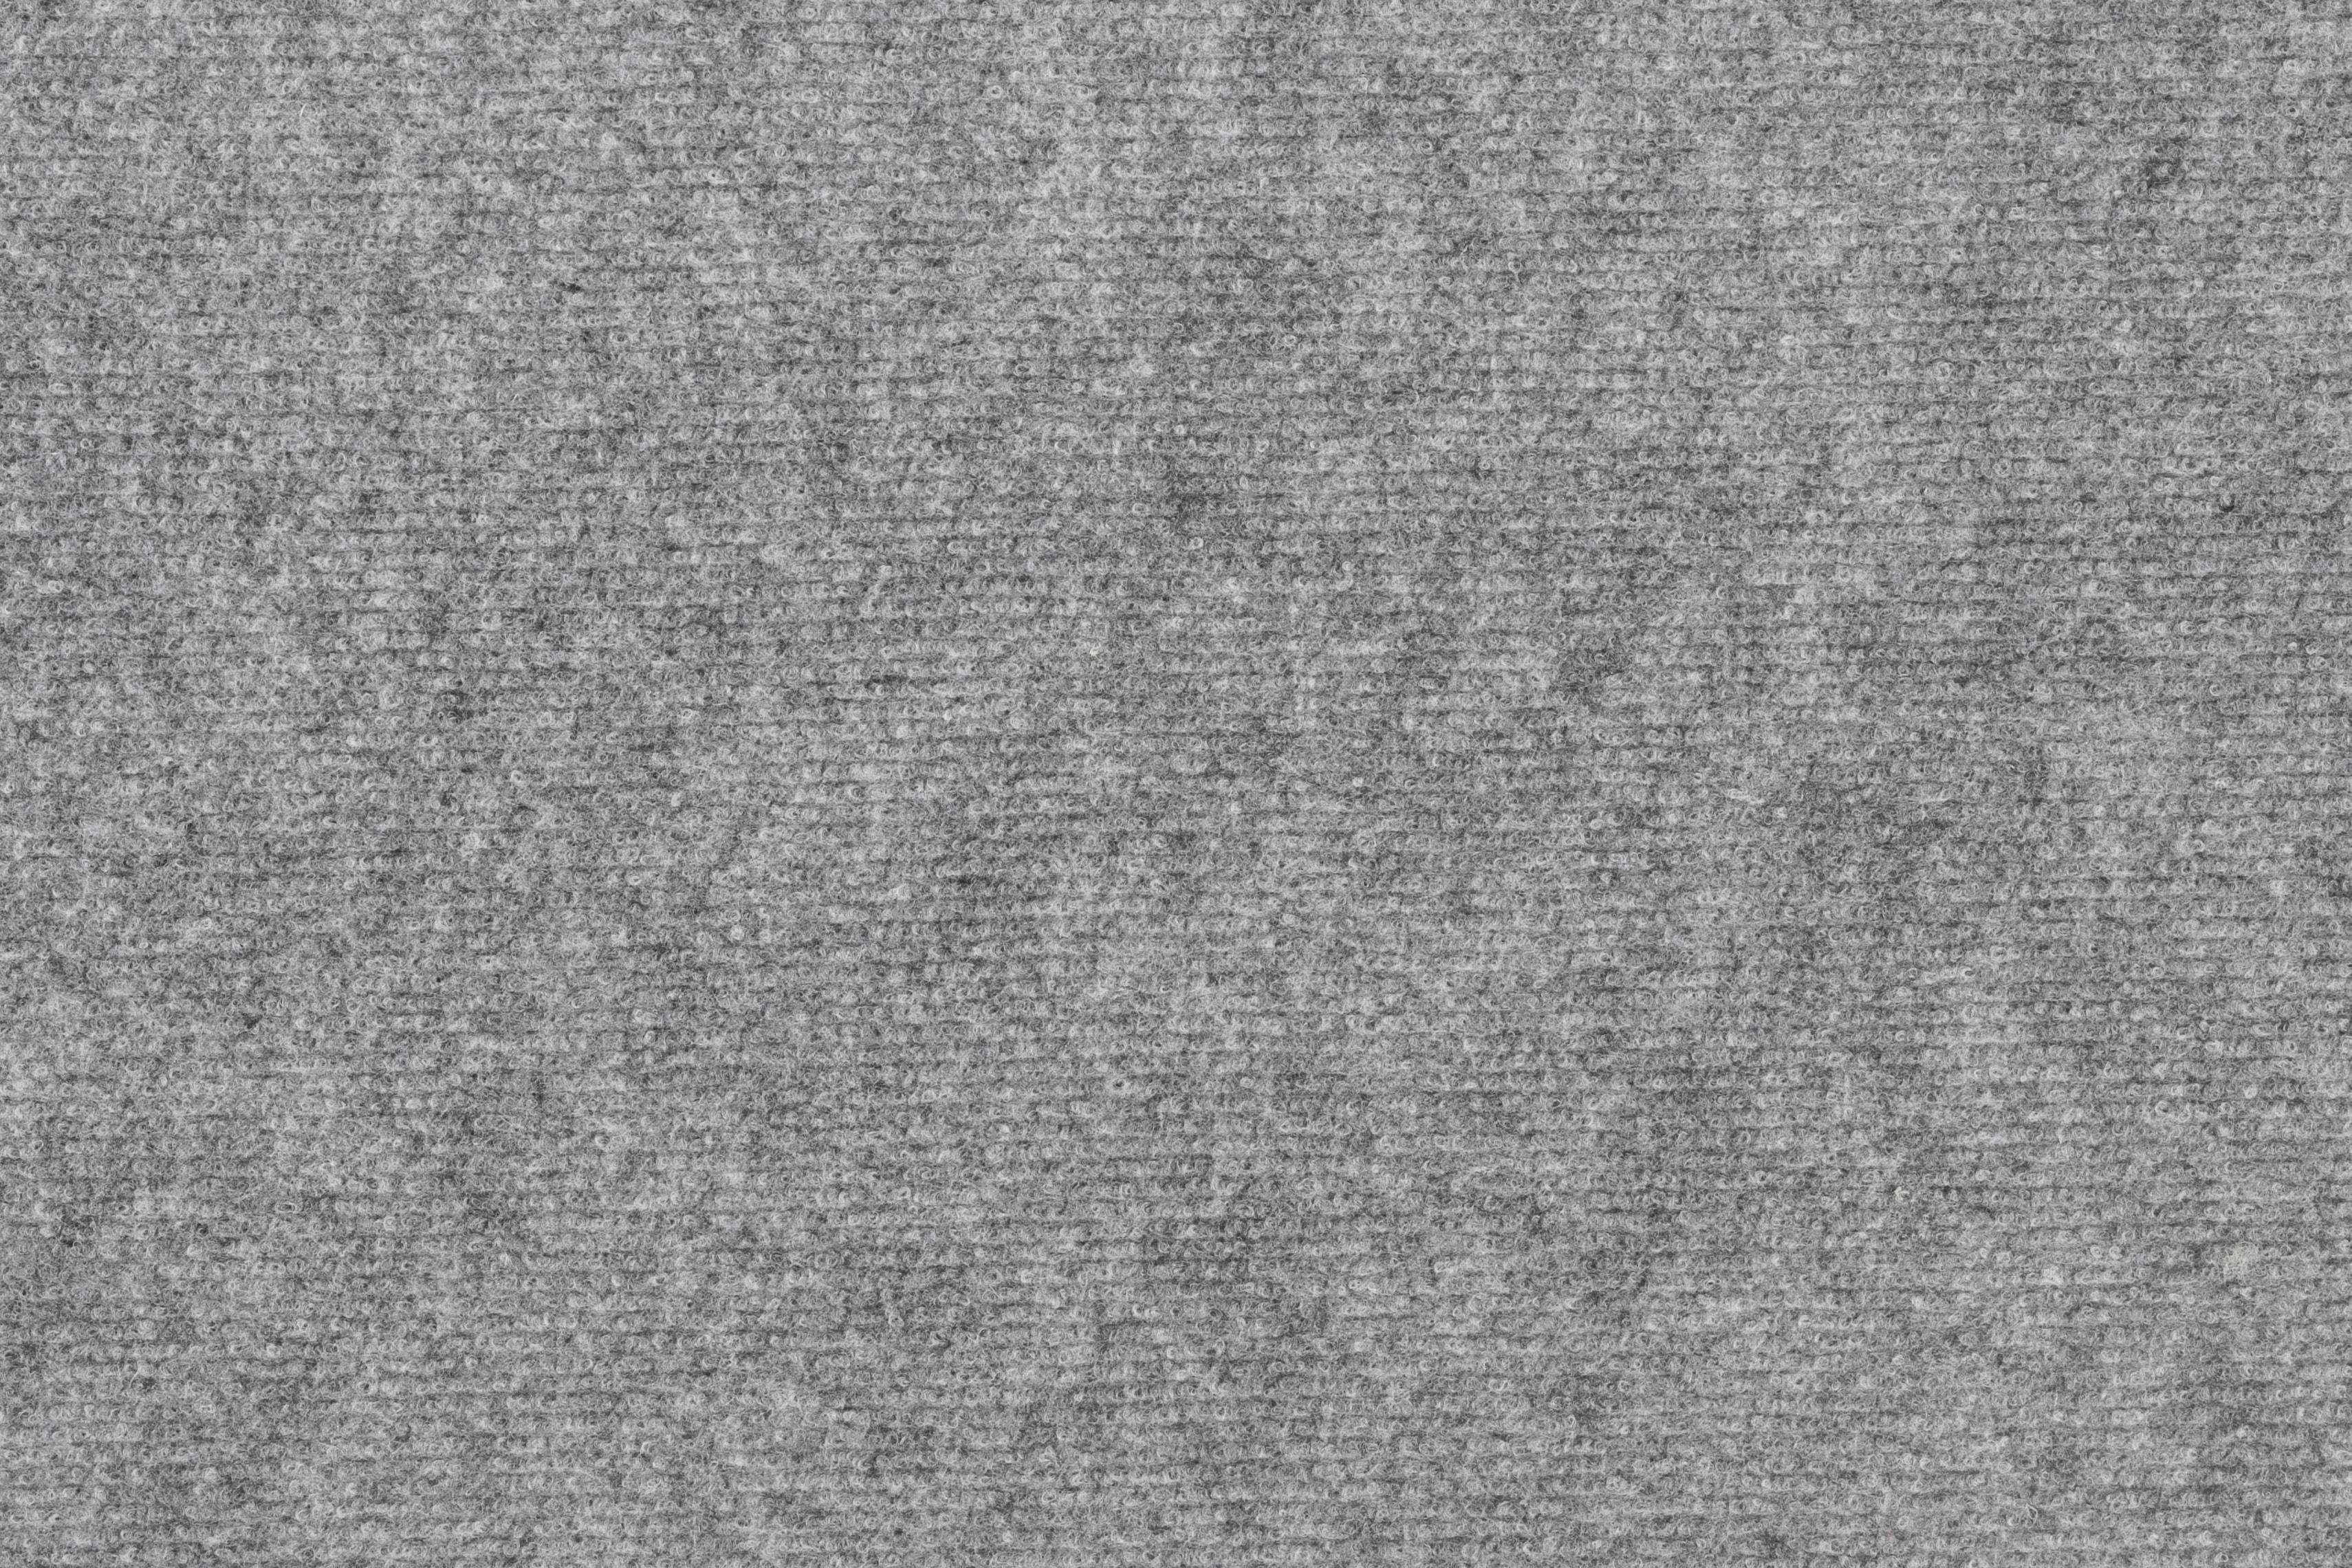 ANDIAMO Teppichboden »Milo«, 2 x 3m | Baumarkt > Bodenbeläge > Teppichboden | Grau | ANDIAMO